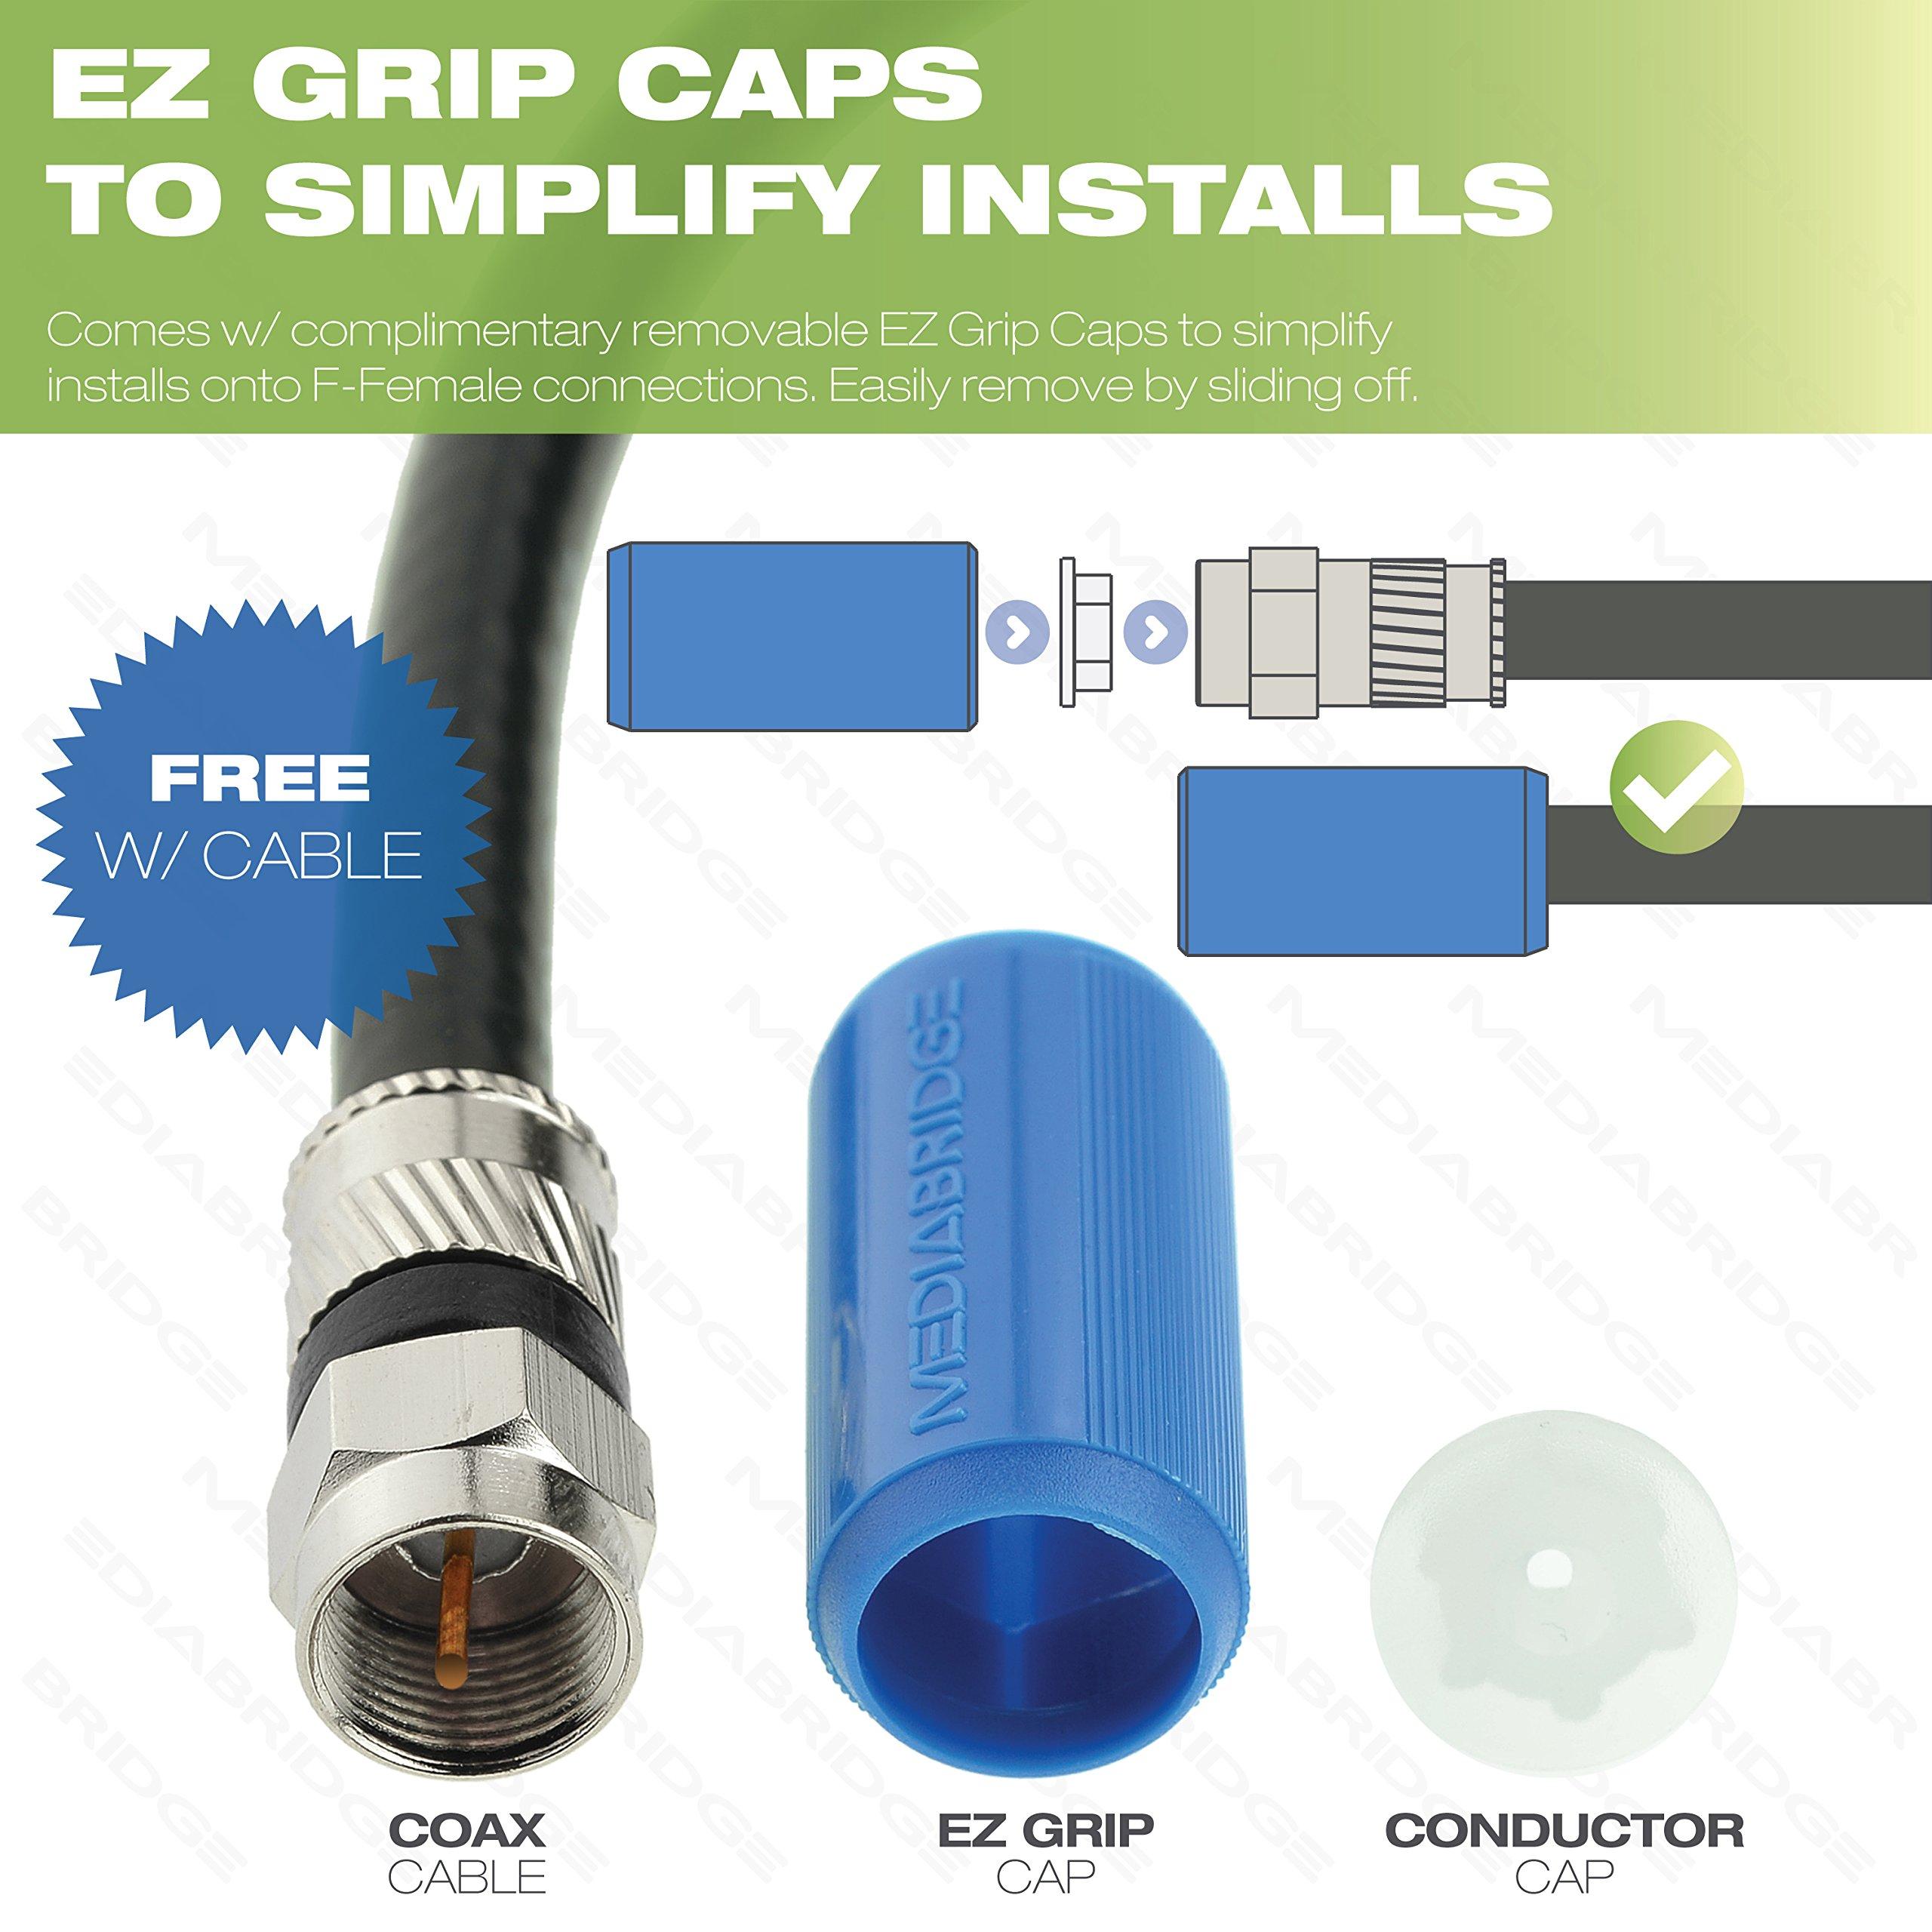 Mediabridge Coaxial Cable (100 Feet) with F-Male Connectors - Tri-Shield CL2 RG6 - Removable EZ Grip Caps ( CJ100-6BF-N1 ) by Mediabridge (Image #3)